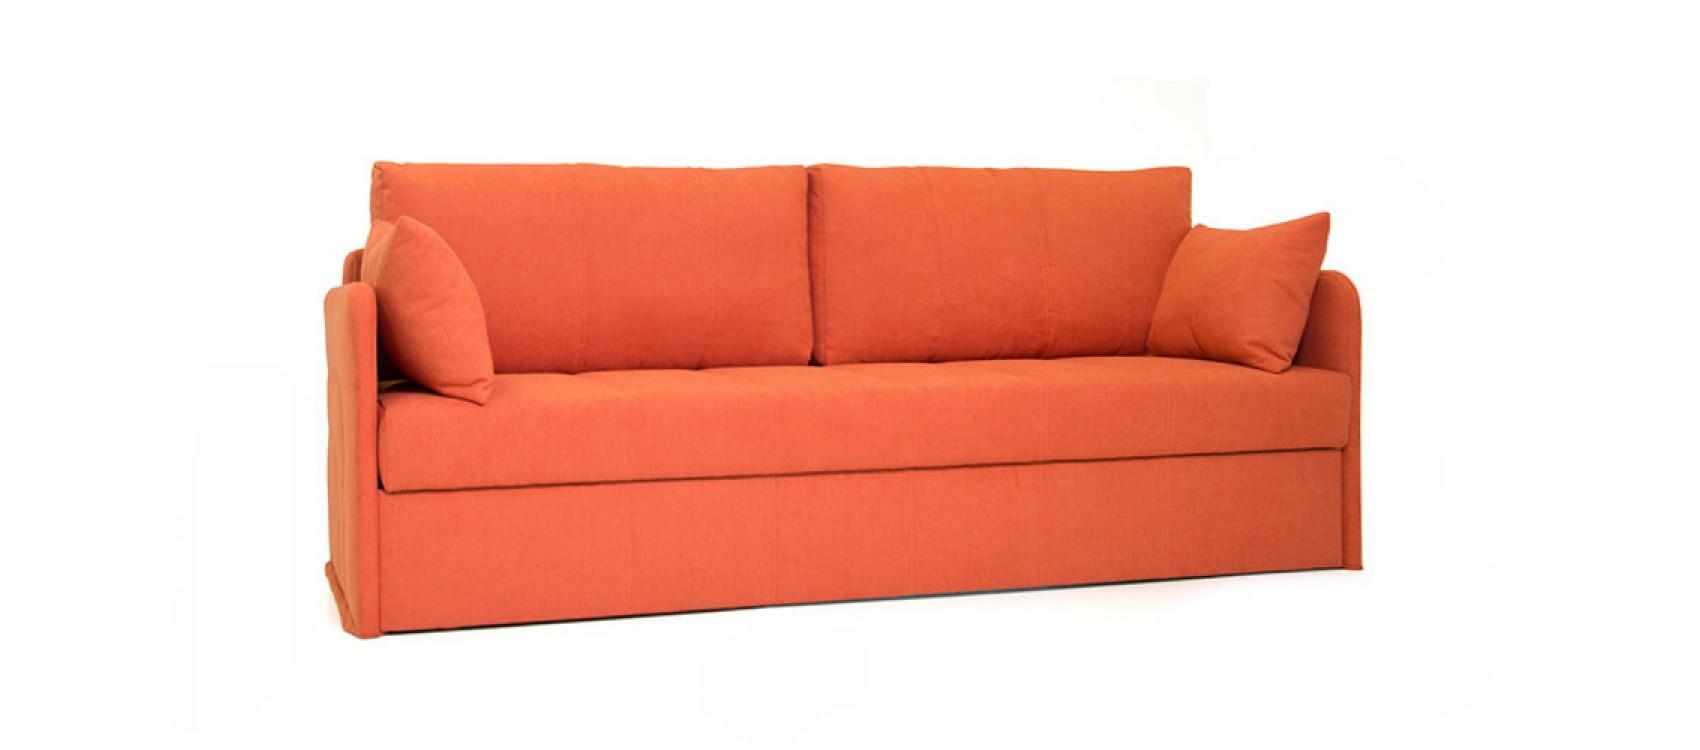 Sofa JOY foto 2